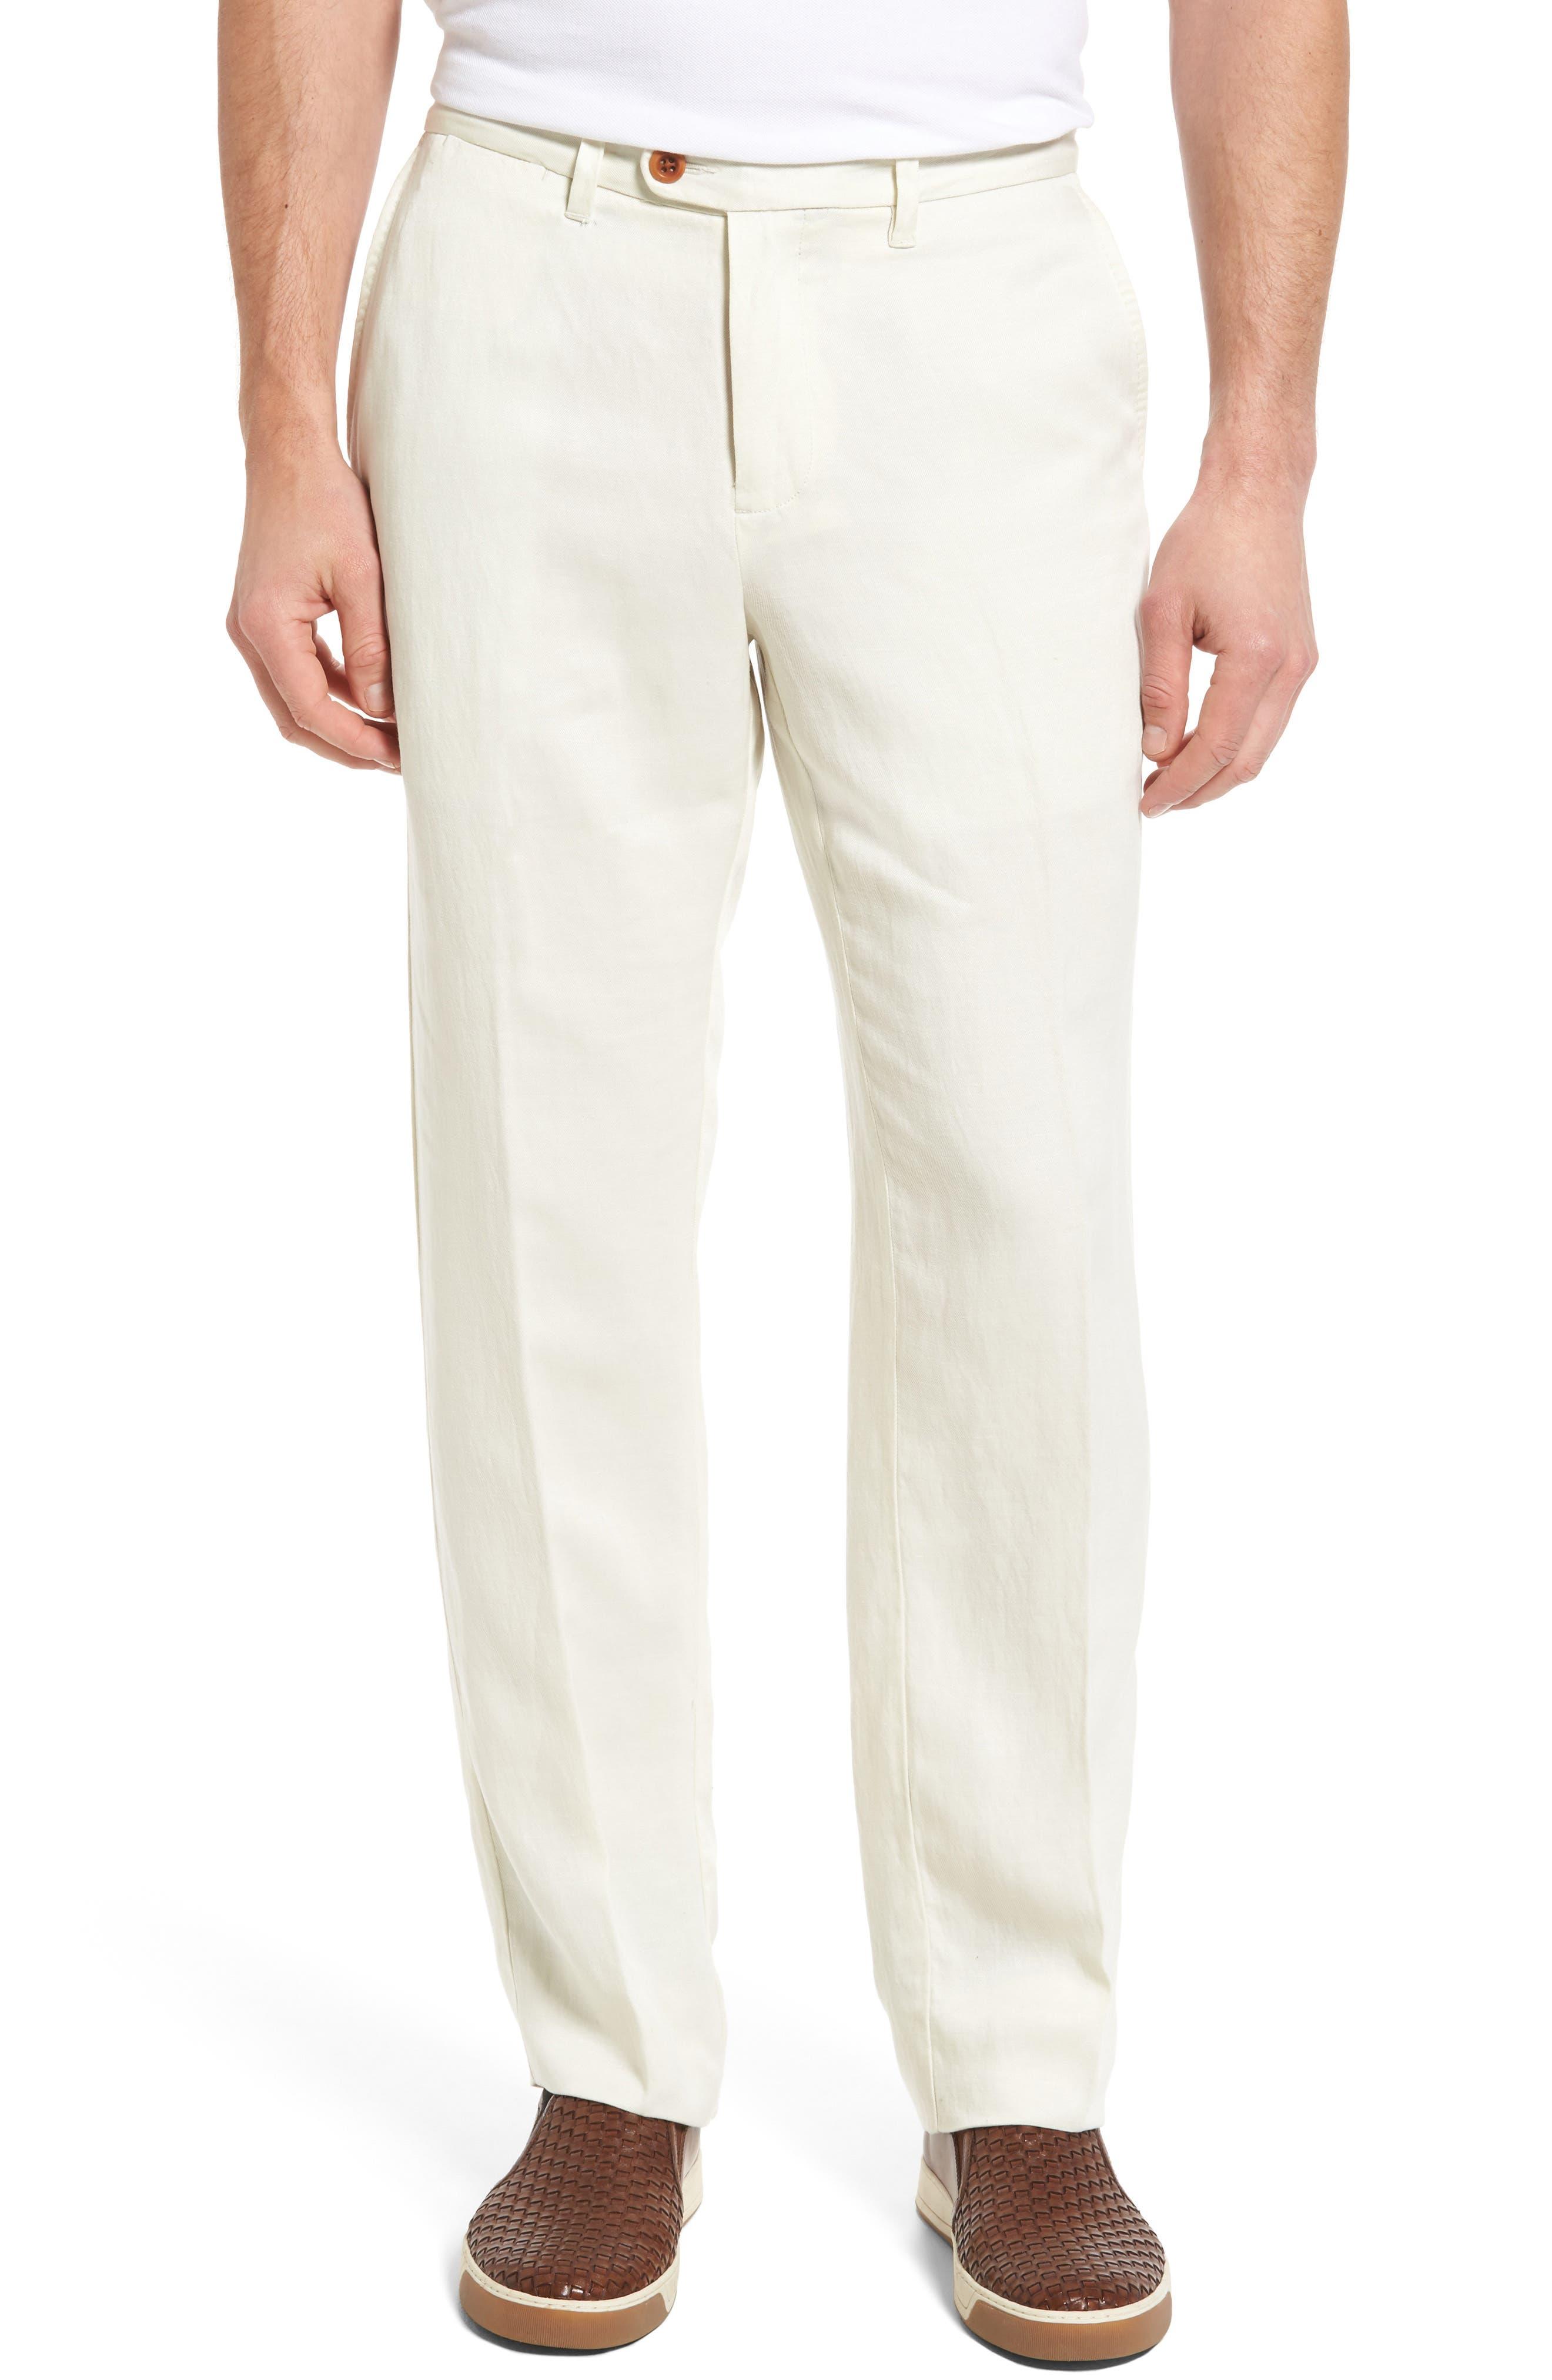 'La Jolla' Flat Front Pants,                             Main thumbnail 1, color,                             250